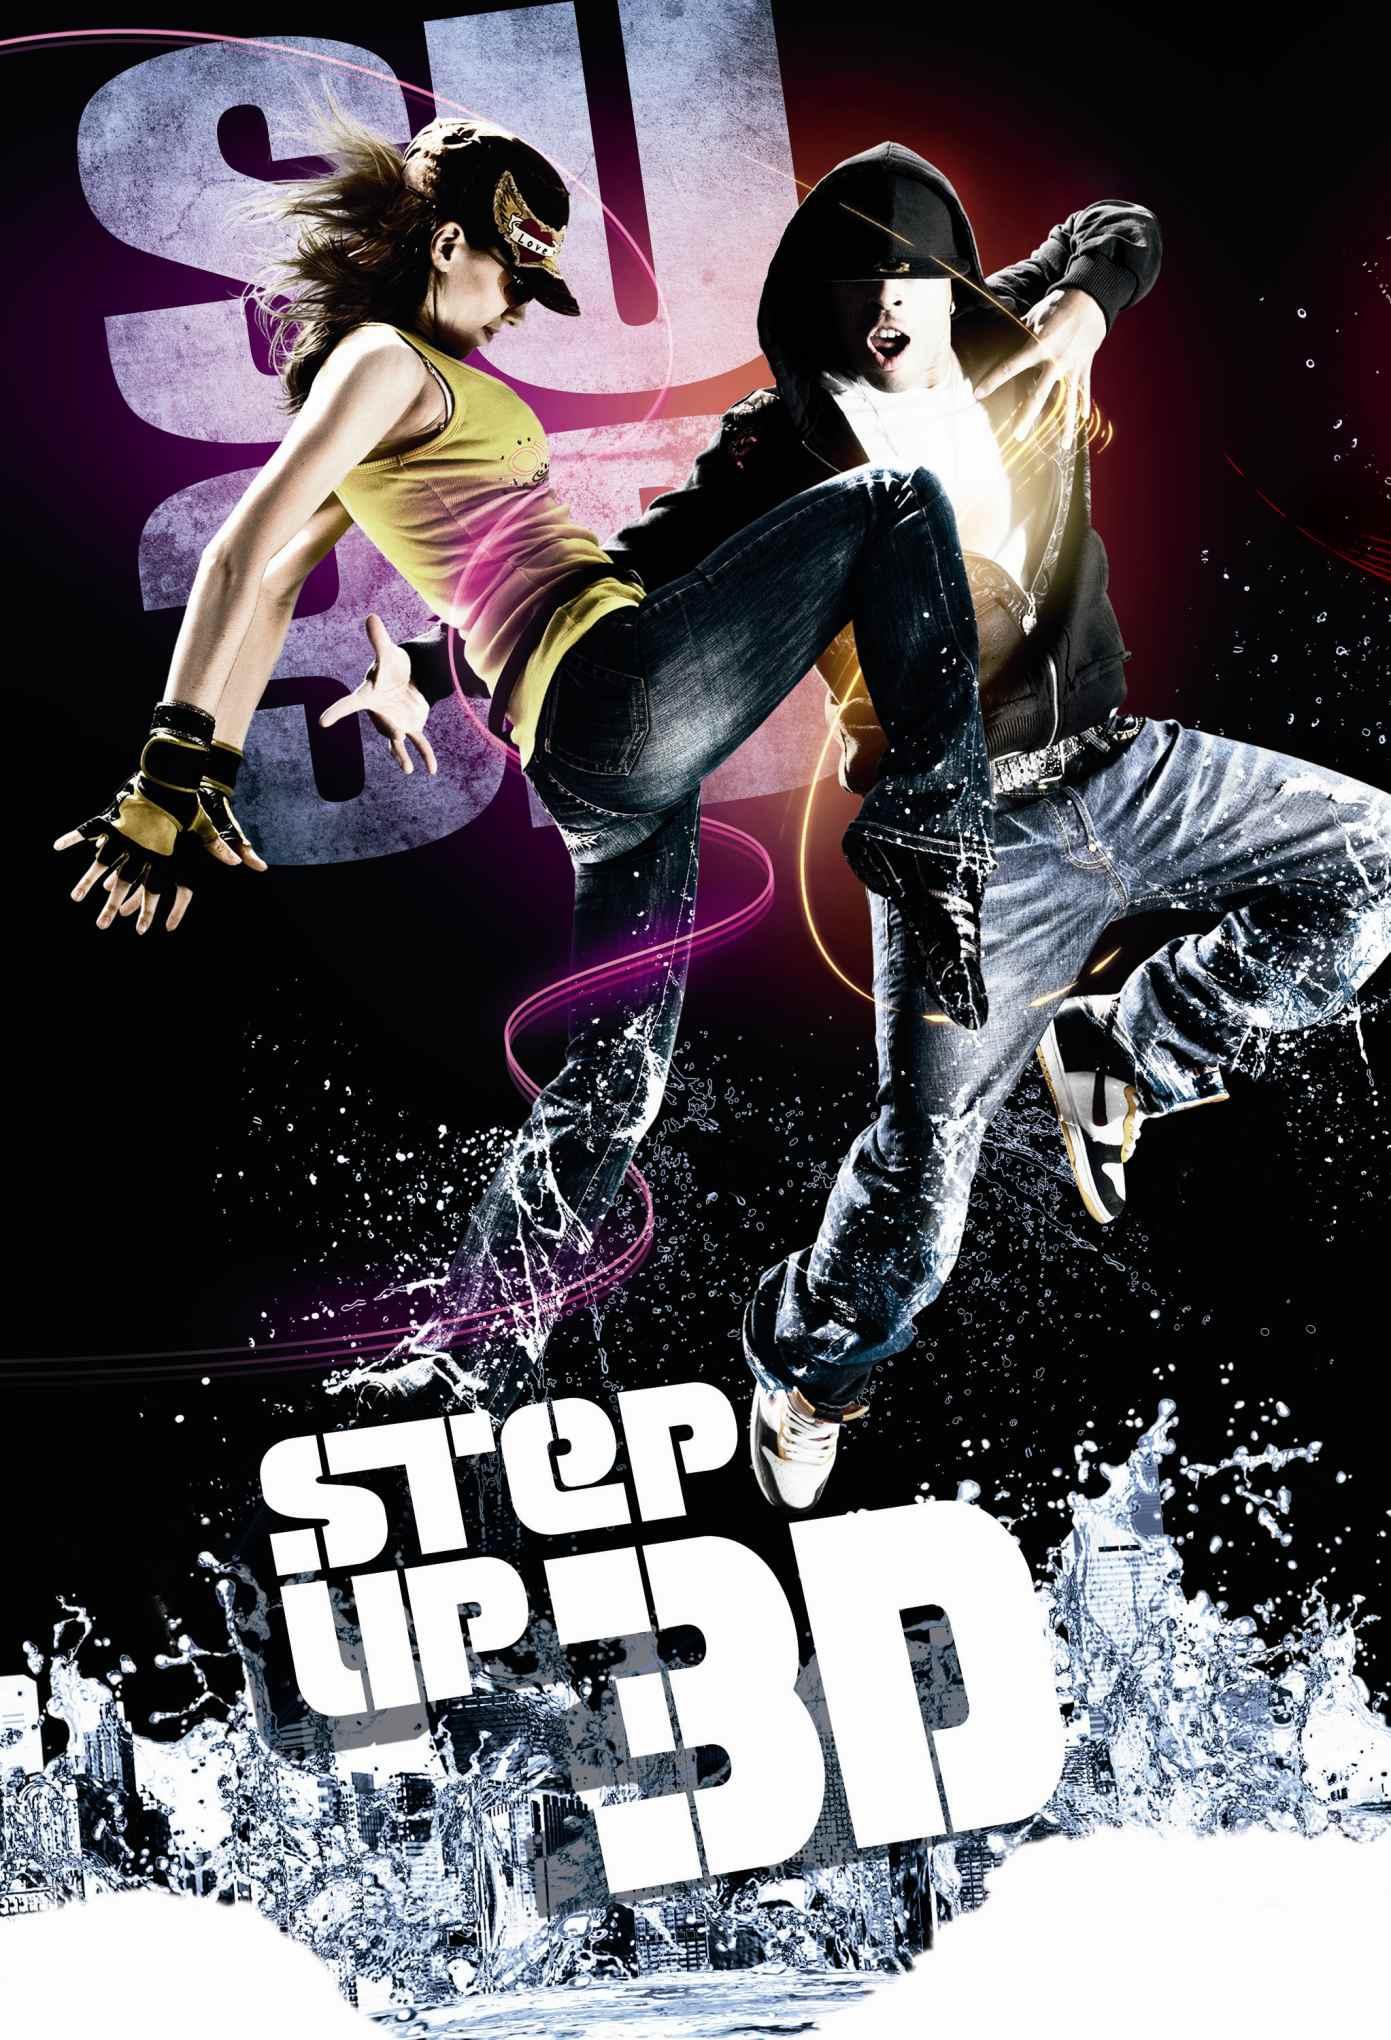 watch full movie step up 3d 2010 online free drama film - HD800×1173